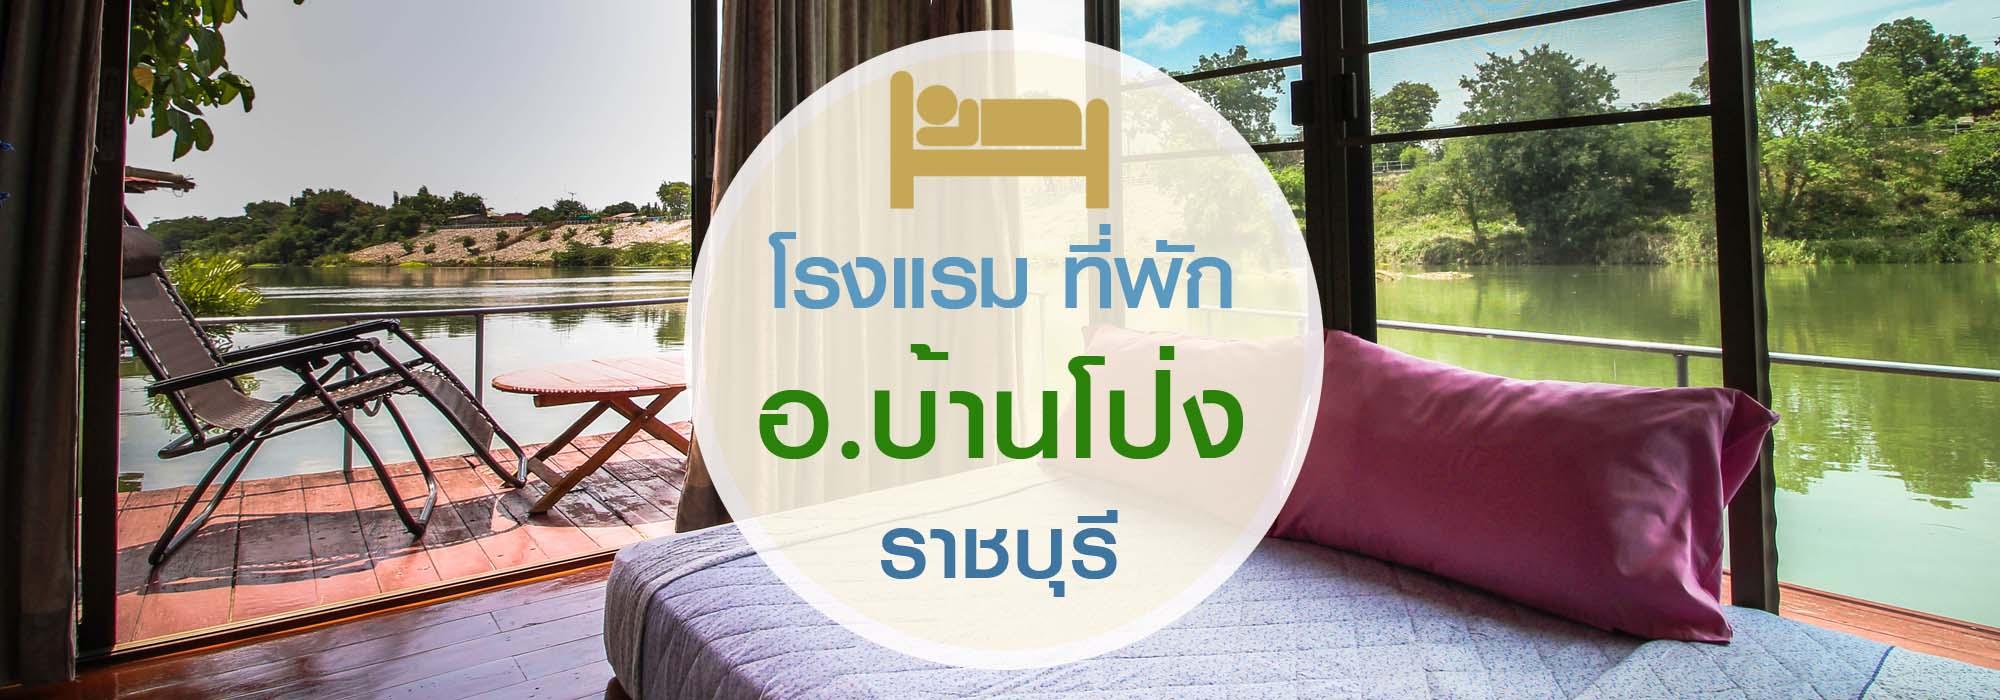 hotel rb_bp